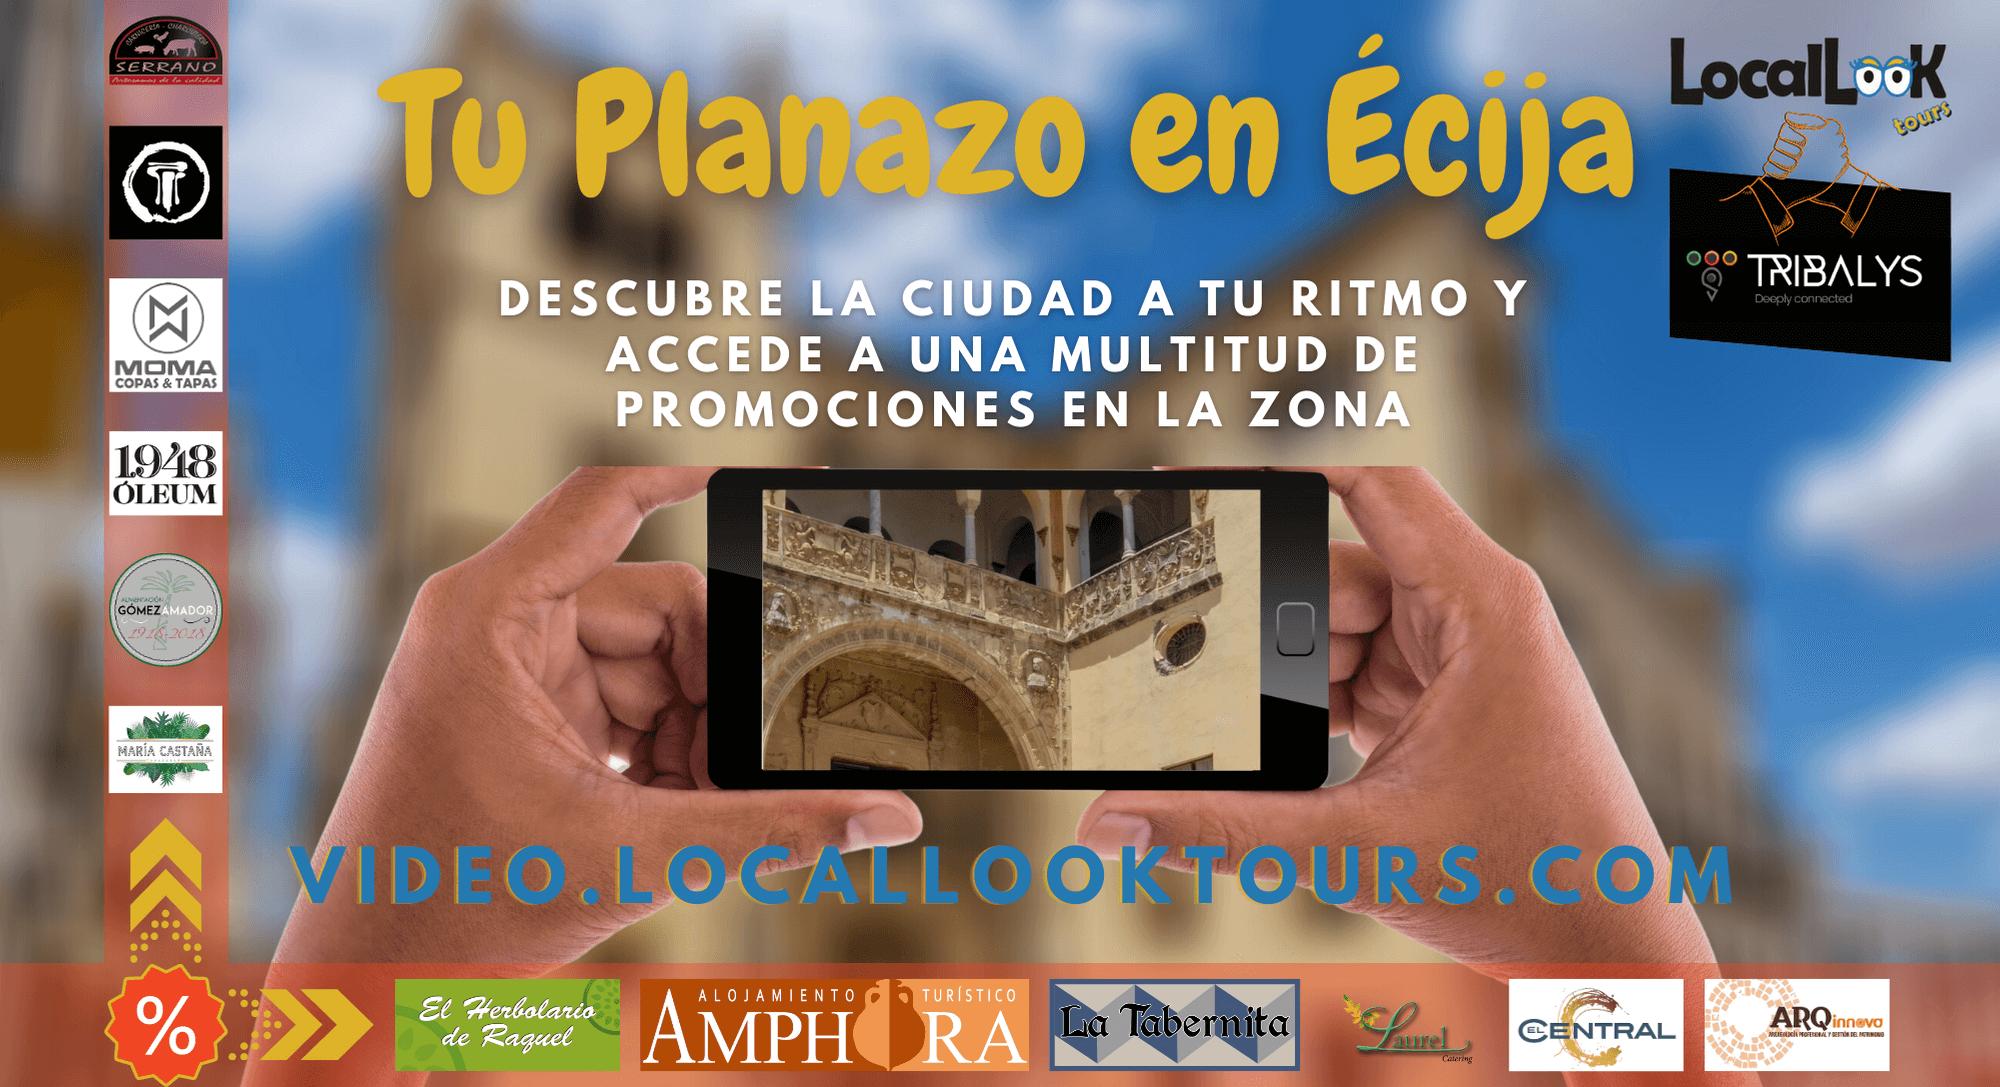 Video guías Local Look Tours